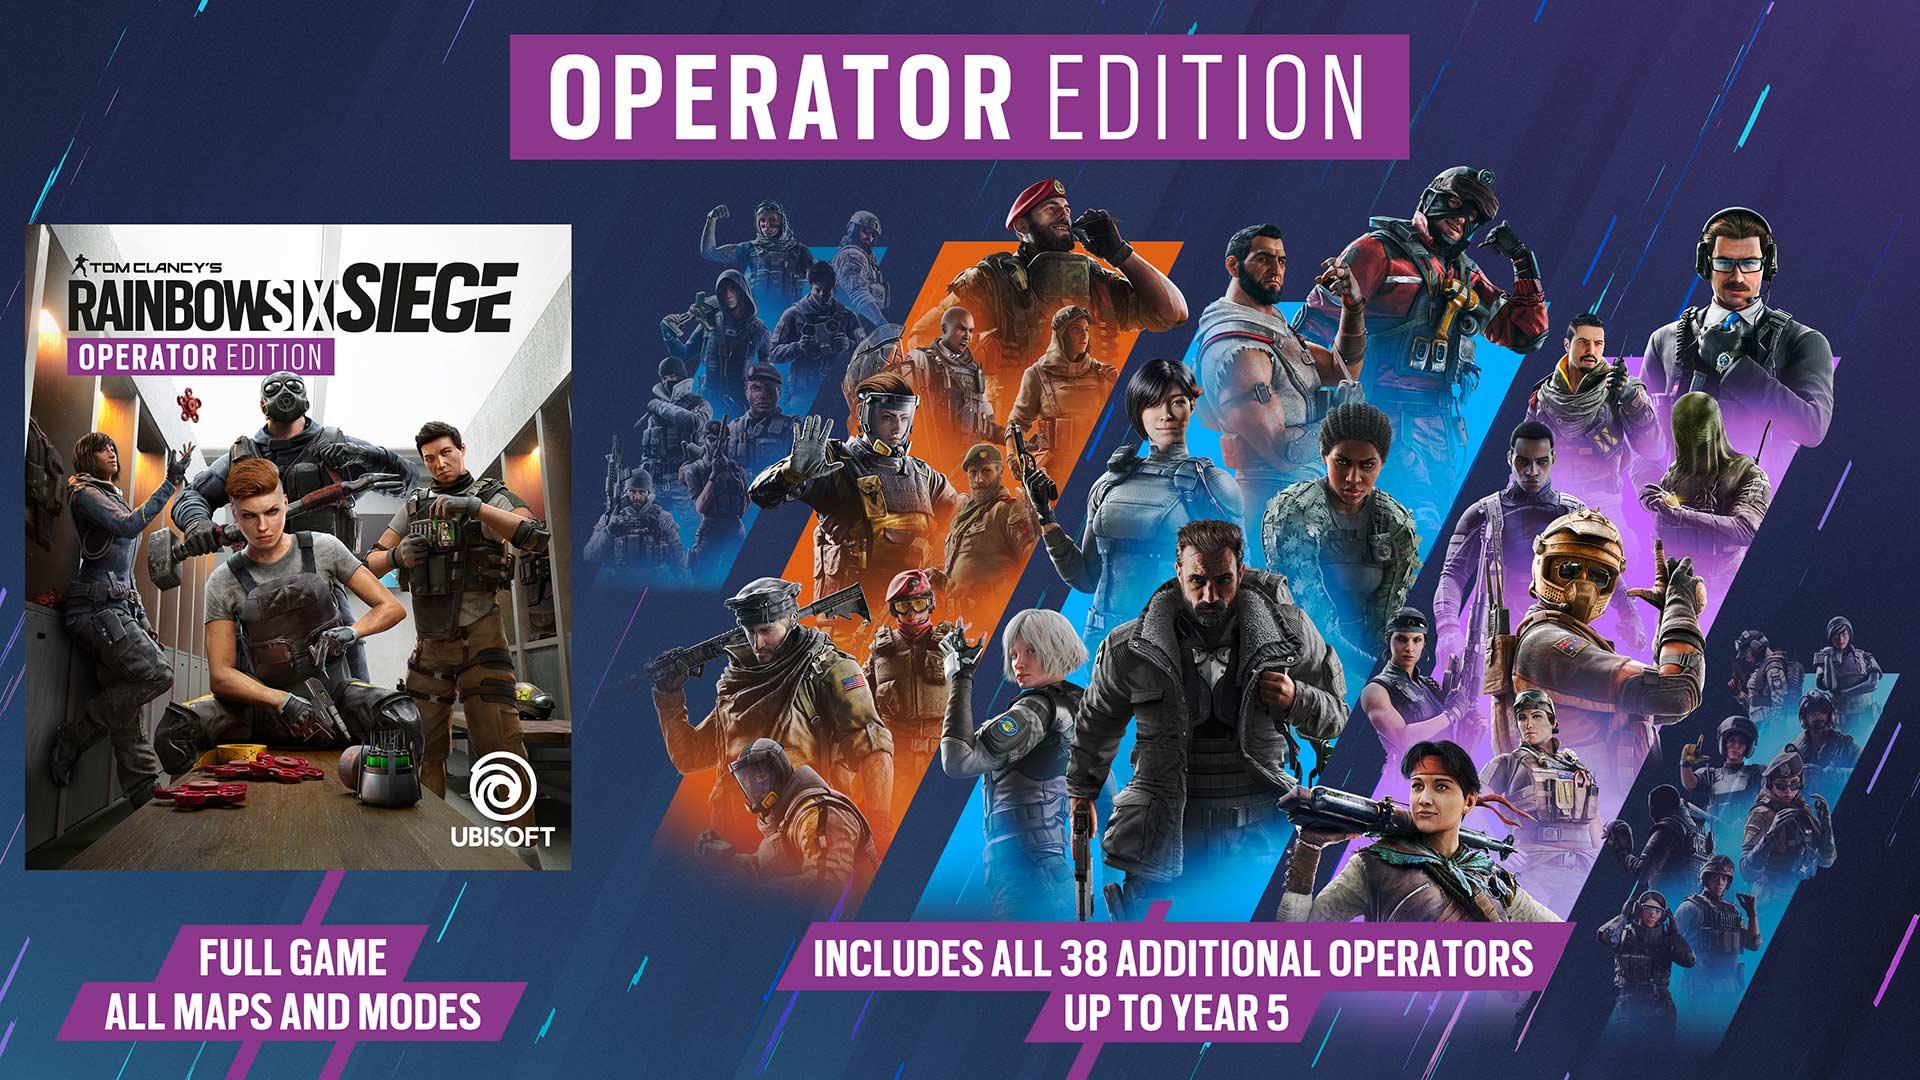 Rainbow Six Siege Operator Edition